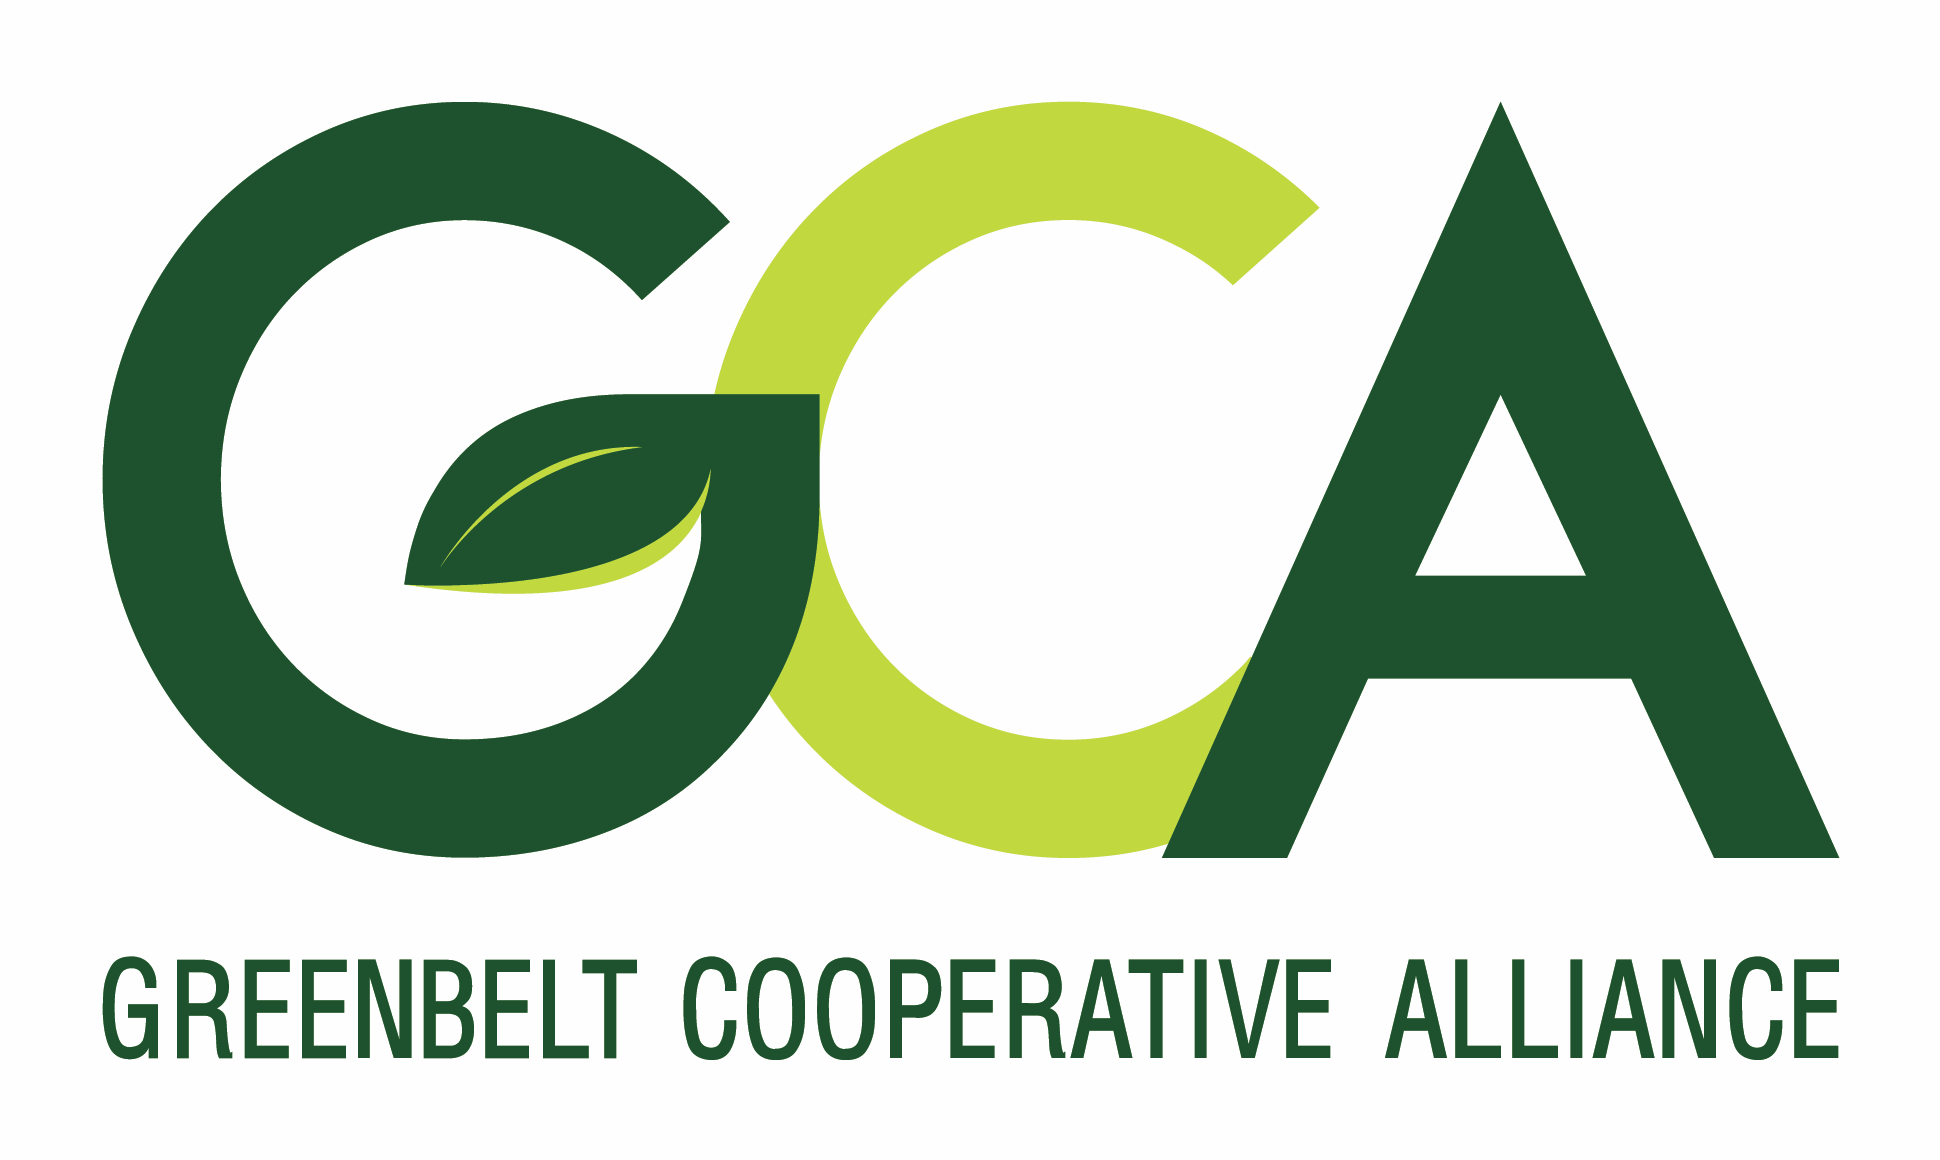 GCA_final_3_logo_color.png